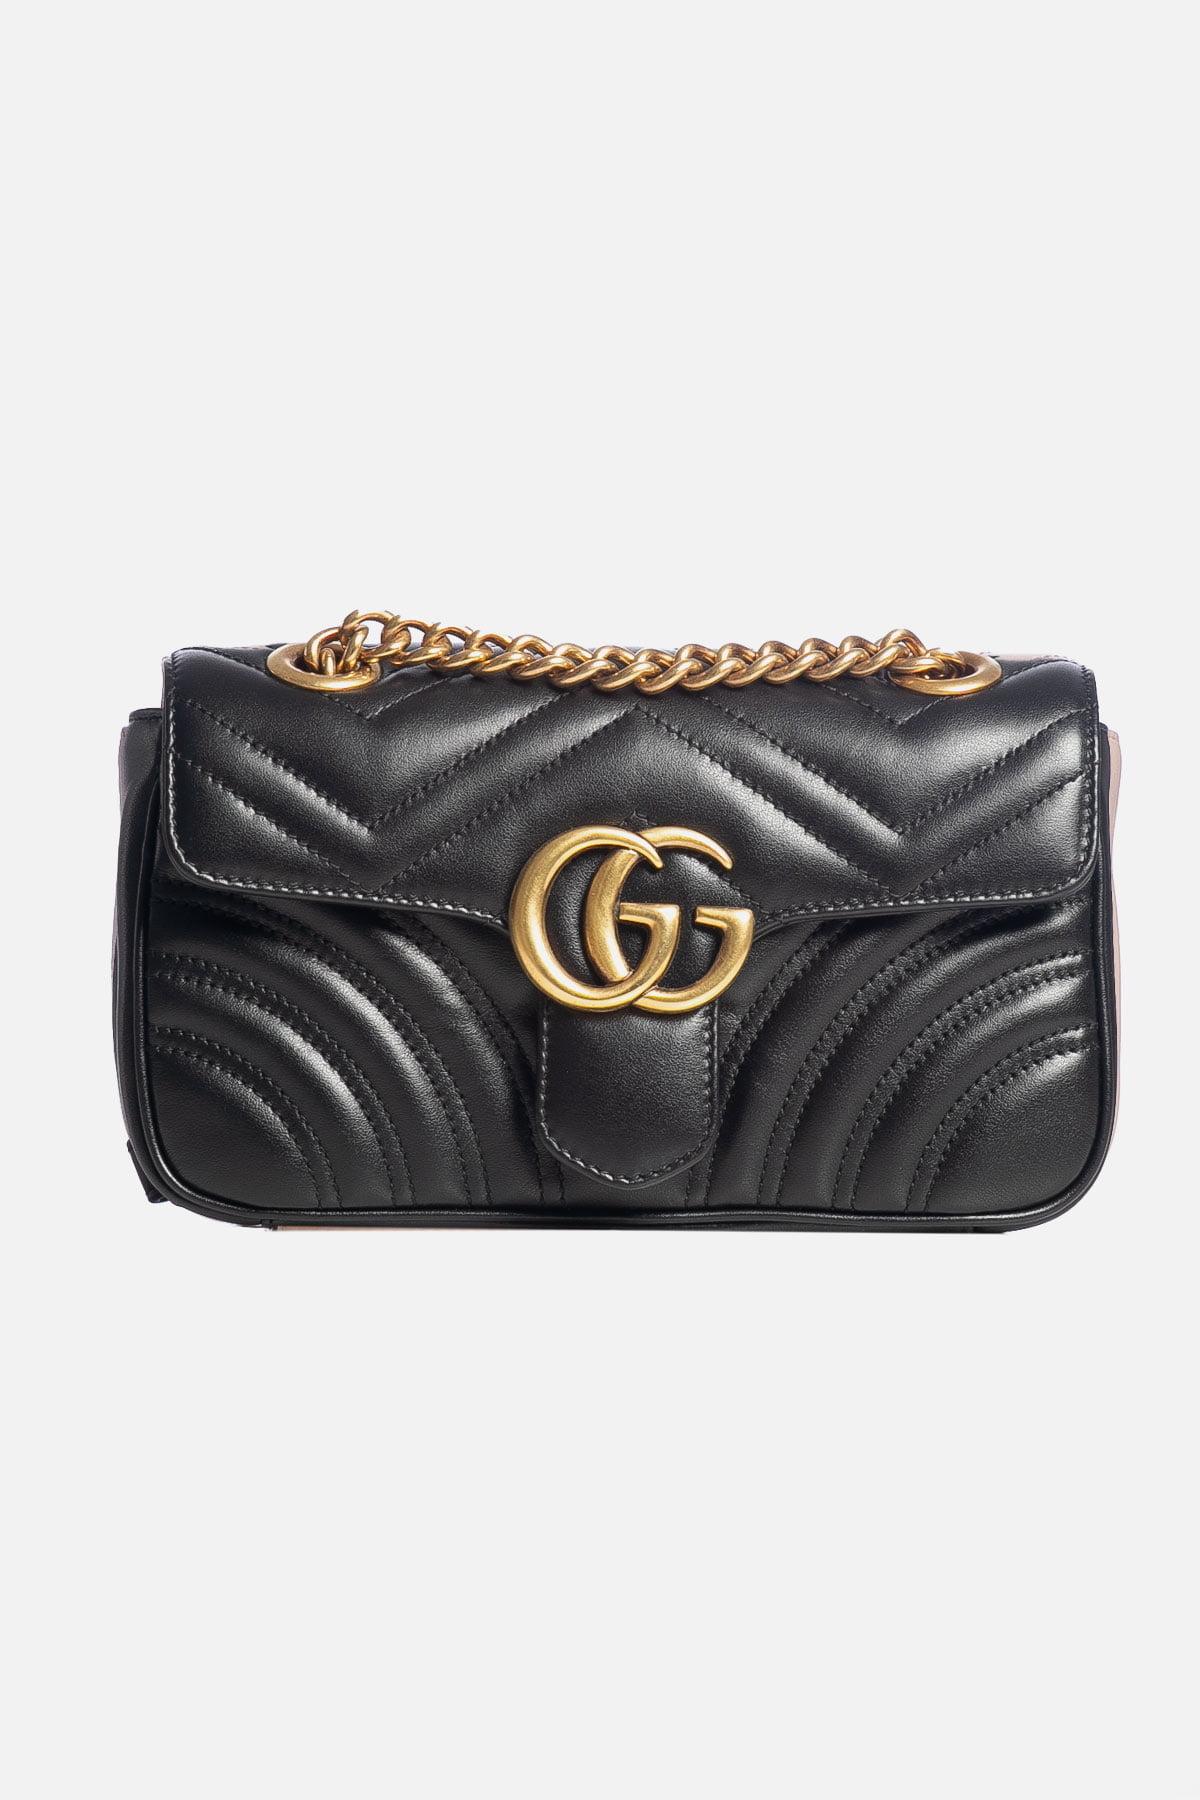 Gucci GG Marmont Mini Matelassé Shoulder Bag Black REWAY 1